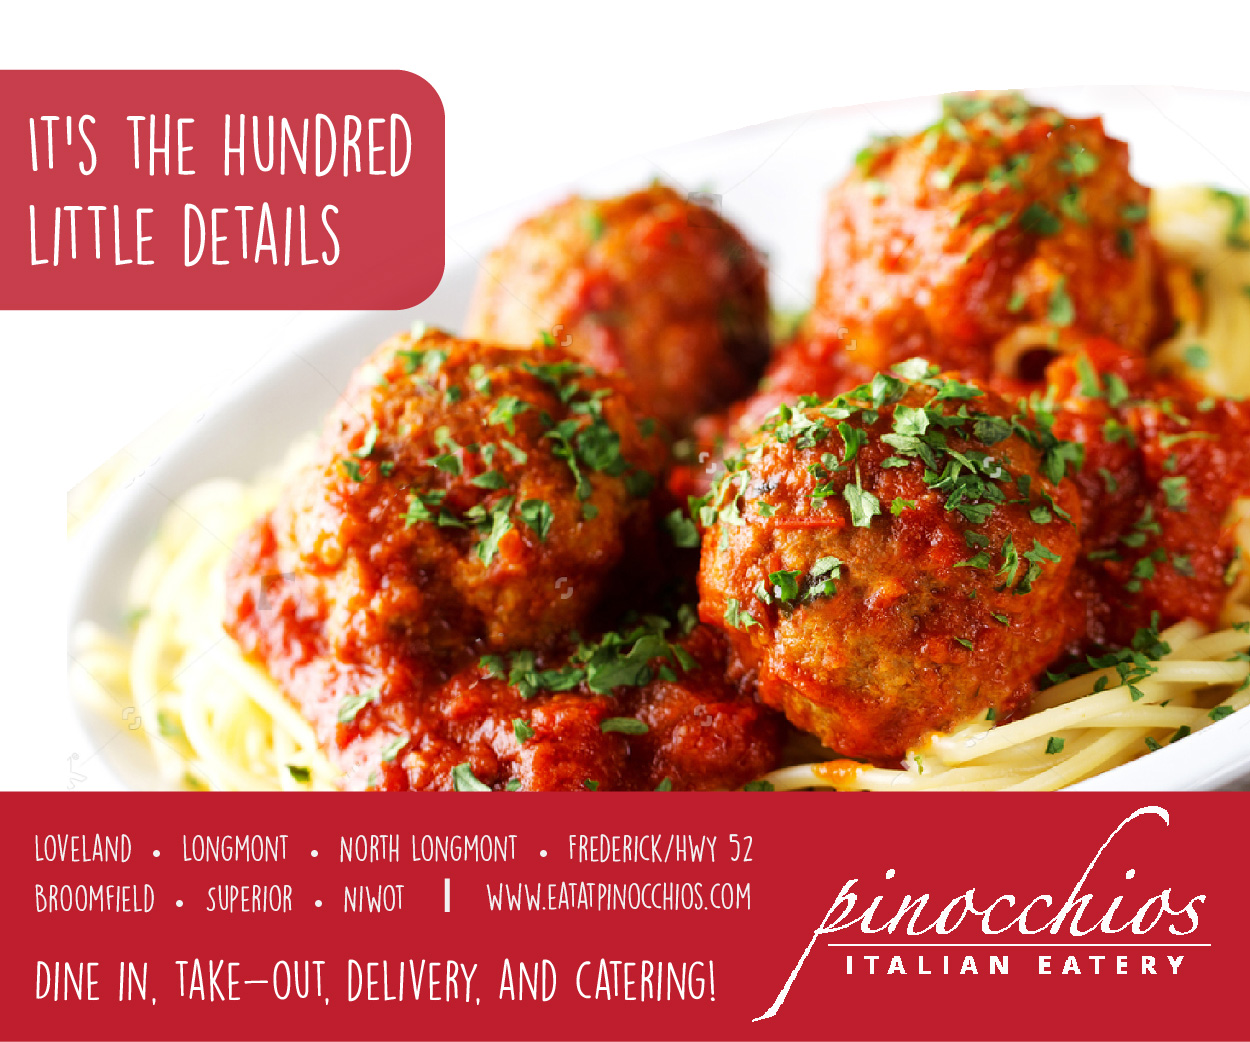 Visit  Pinocchio's Italian Eatery